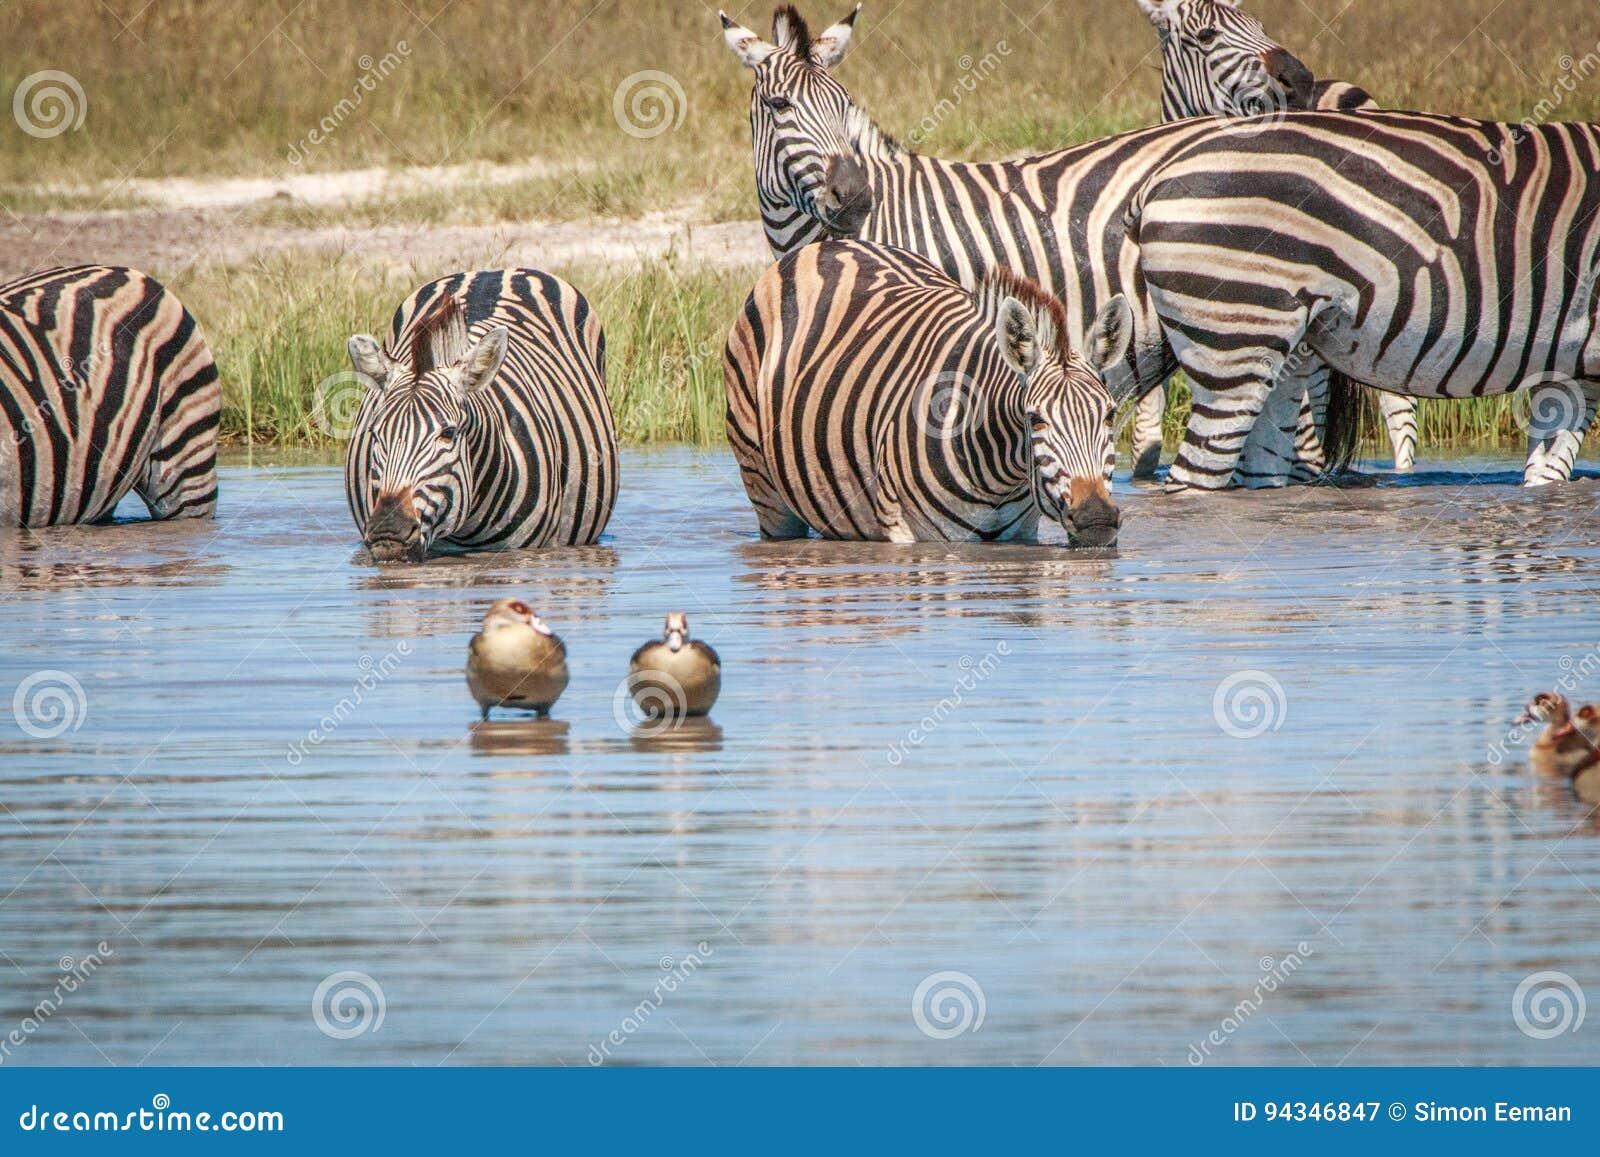 Several Zebras drinking in the Chobe.